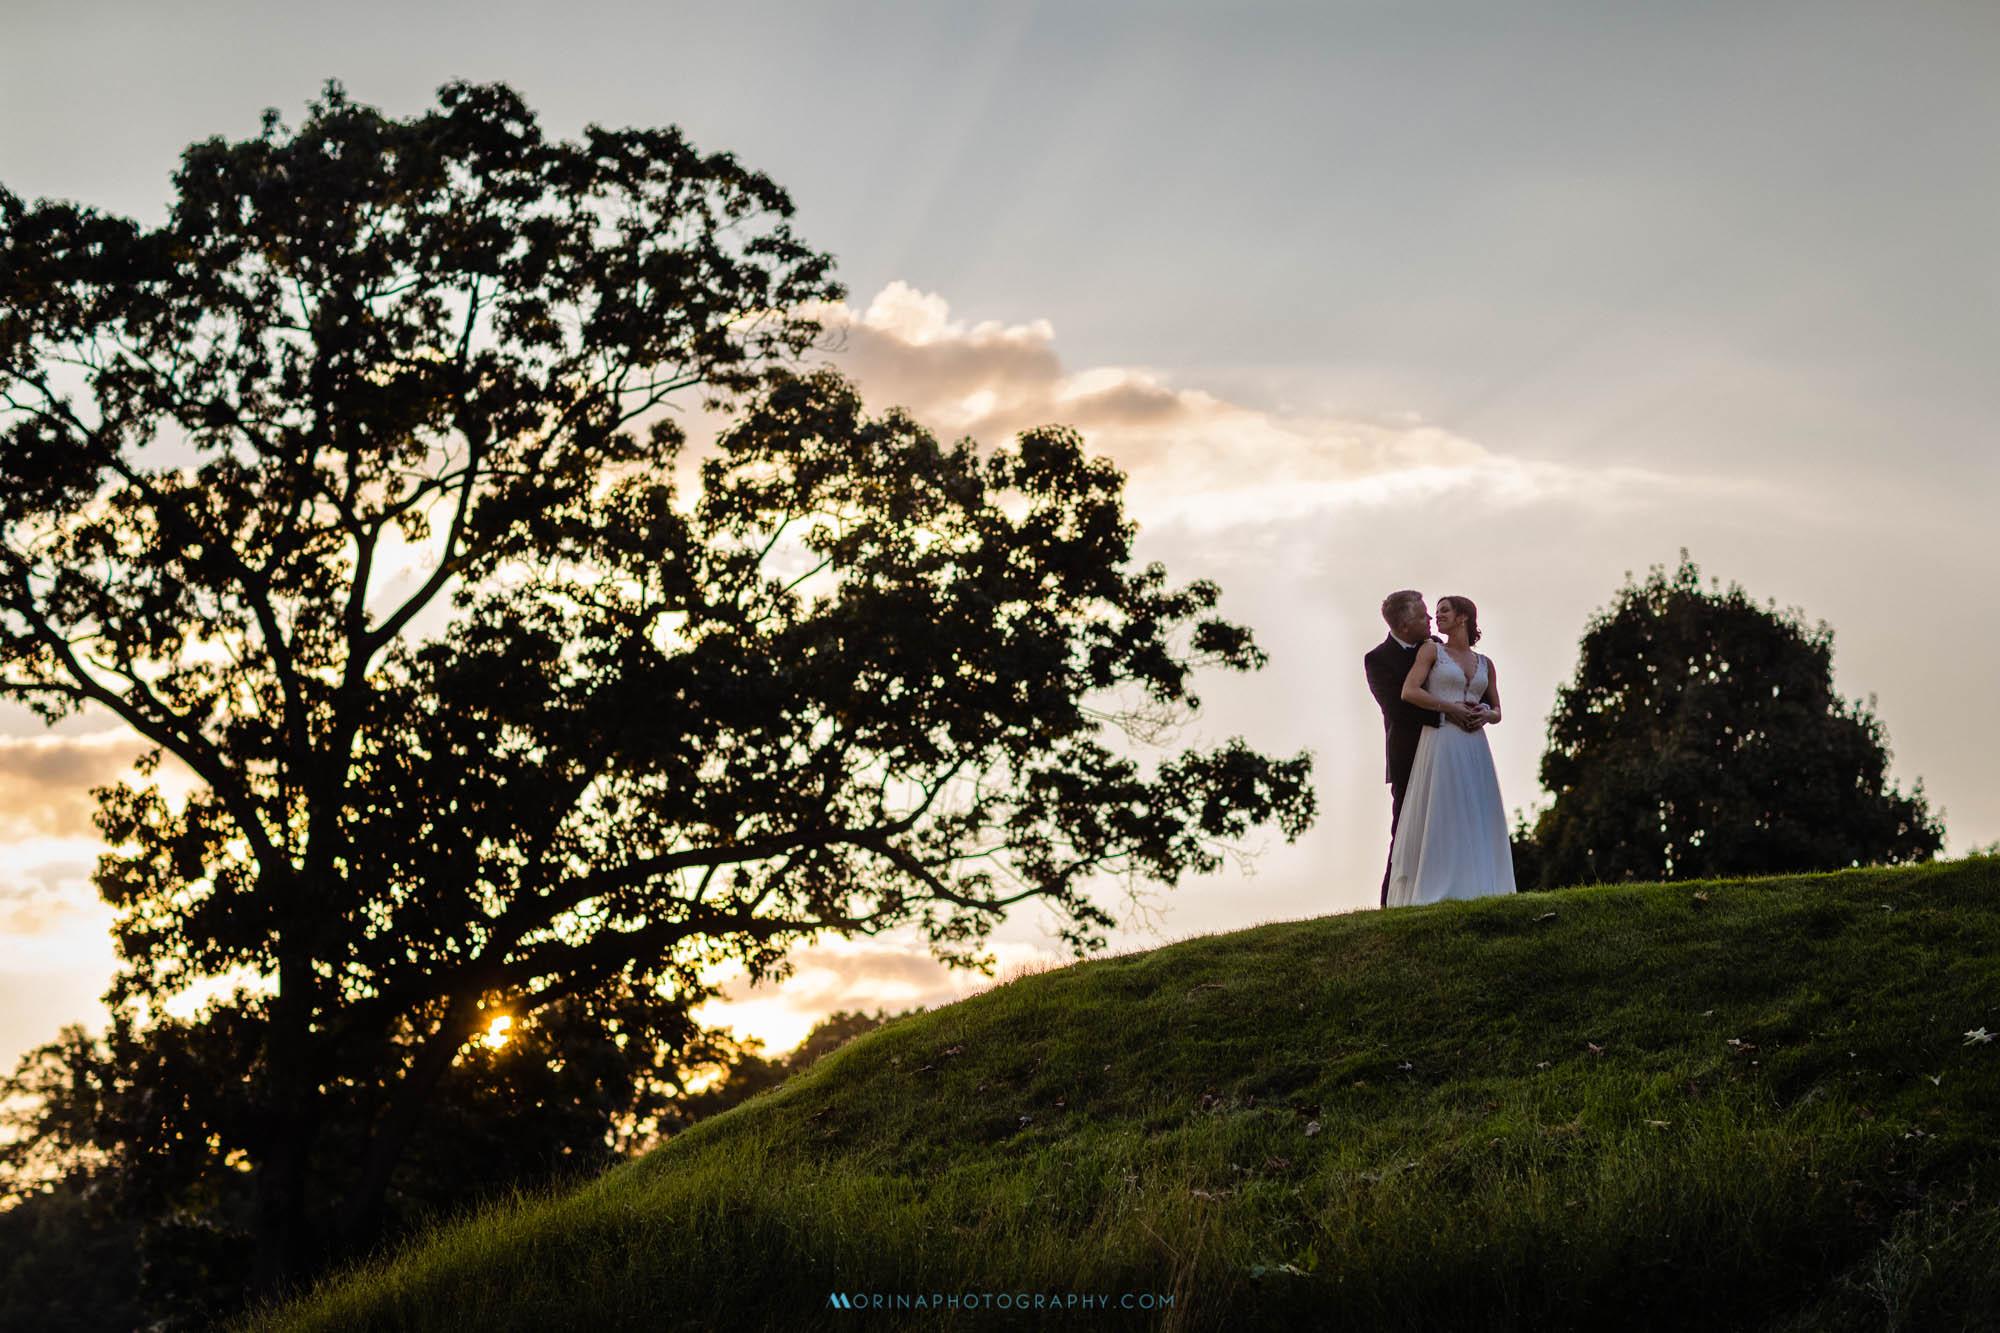 Colleen & Bill Wedding at Manufacturers' Golf & Country Club wedding 0067.jpg